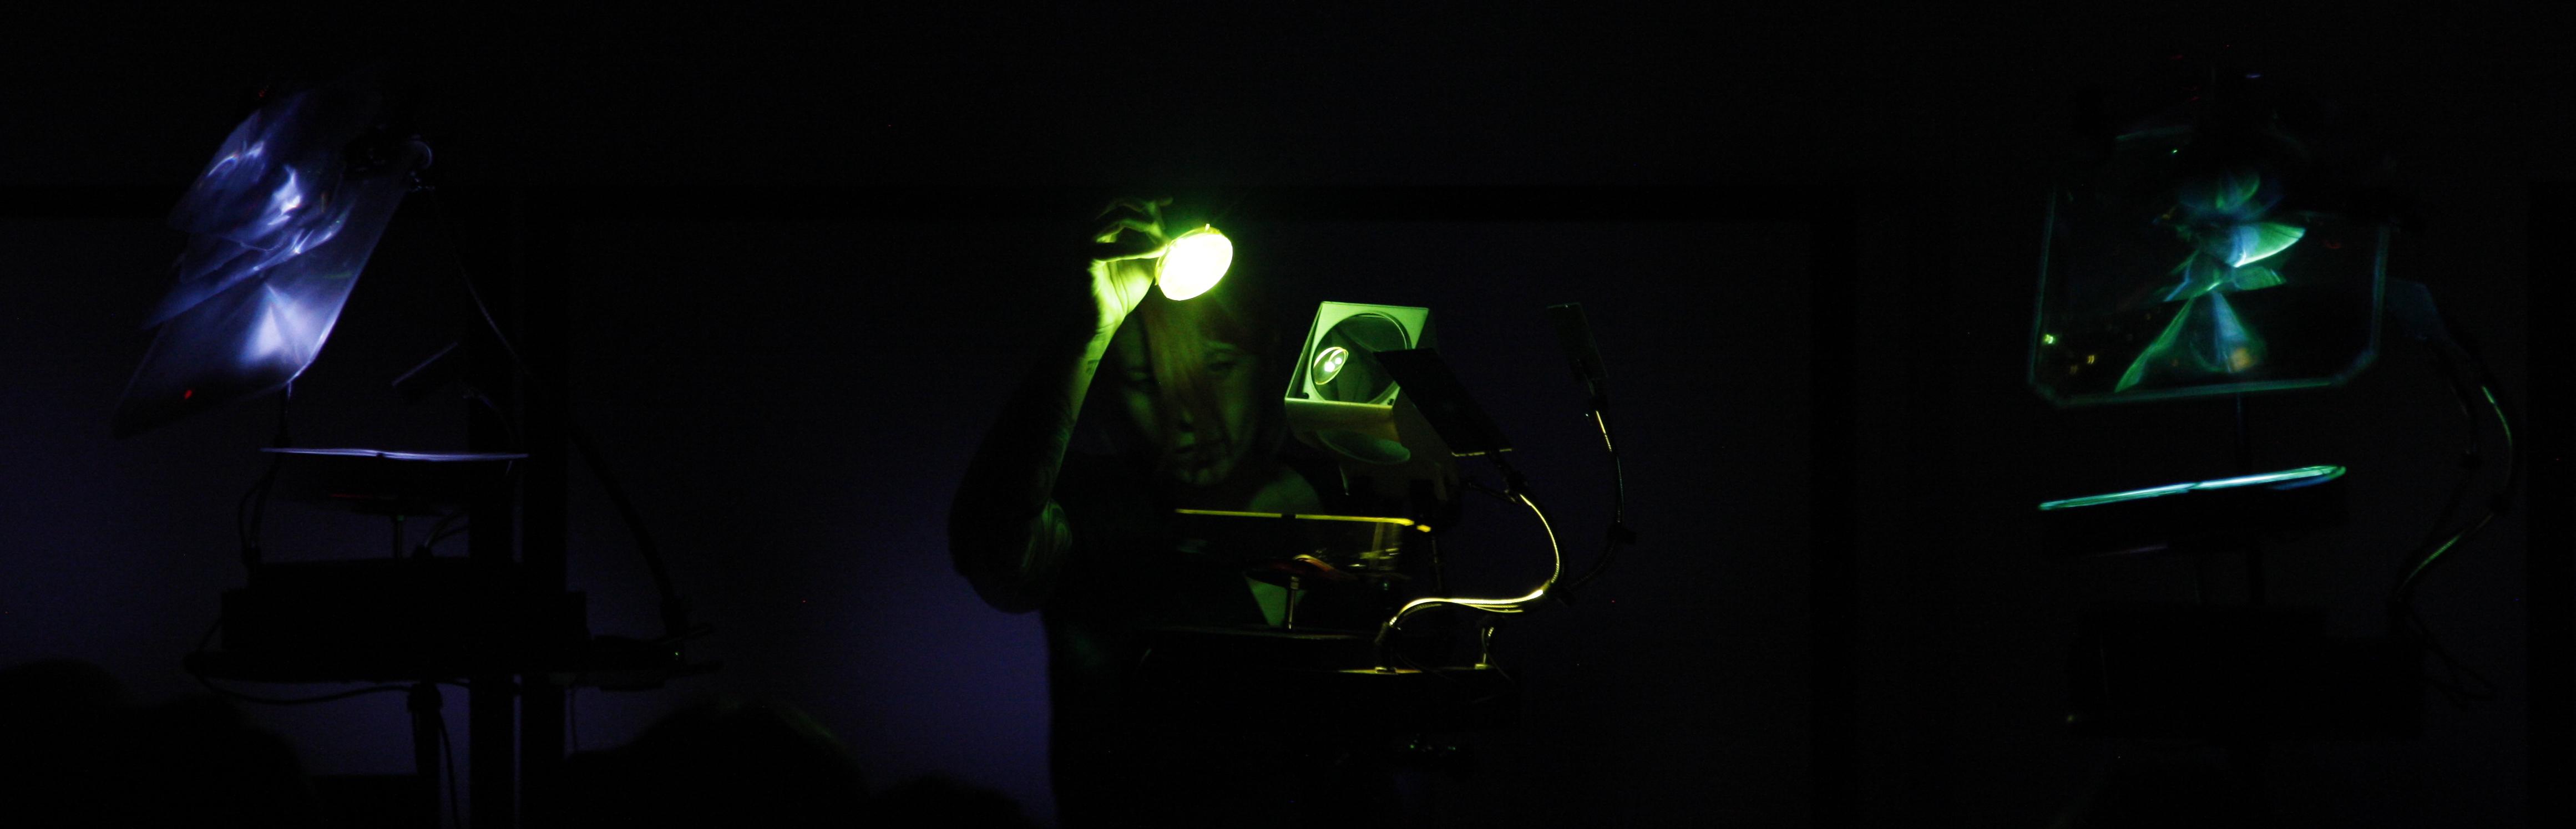 stephanie castonguay en performance scanner me darkly